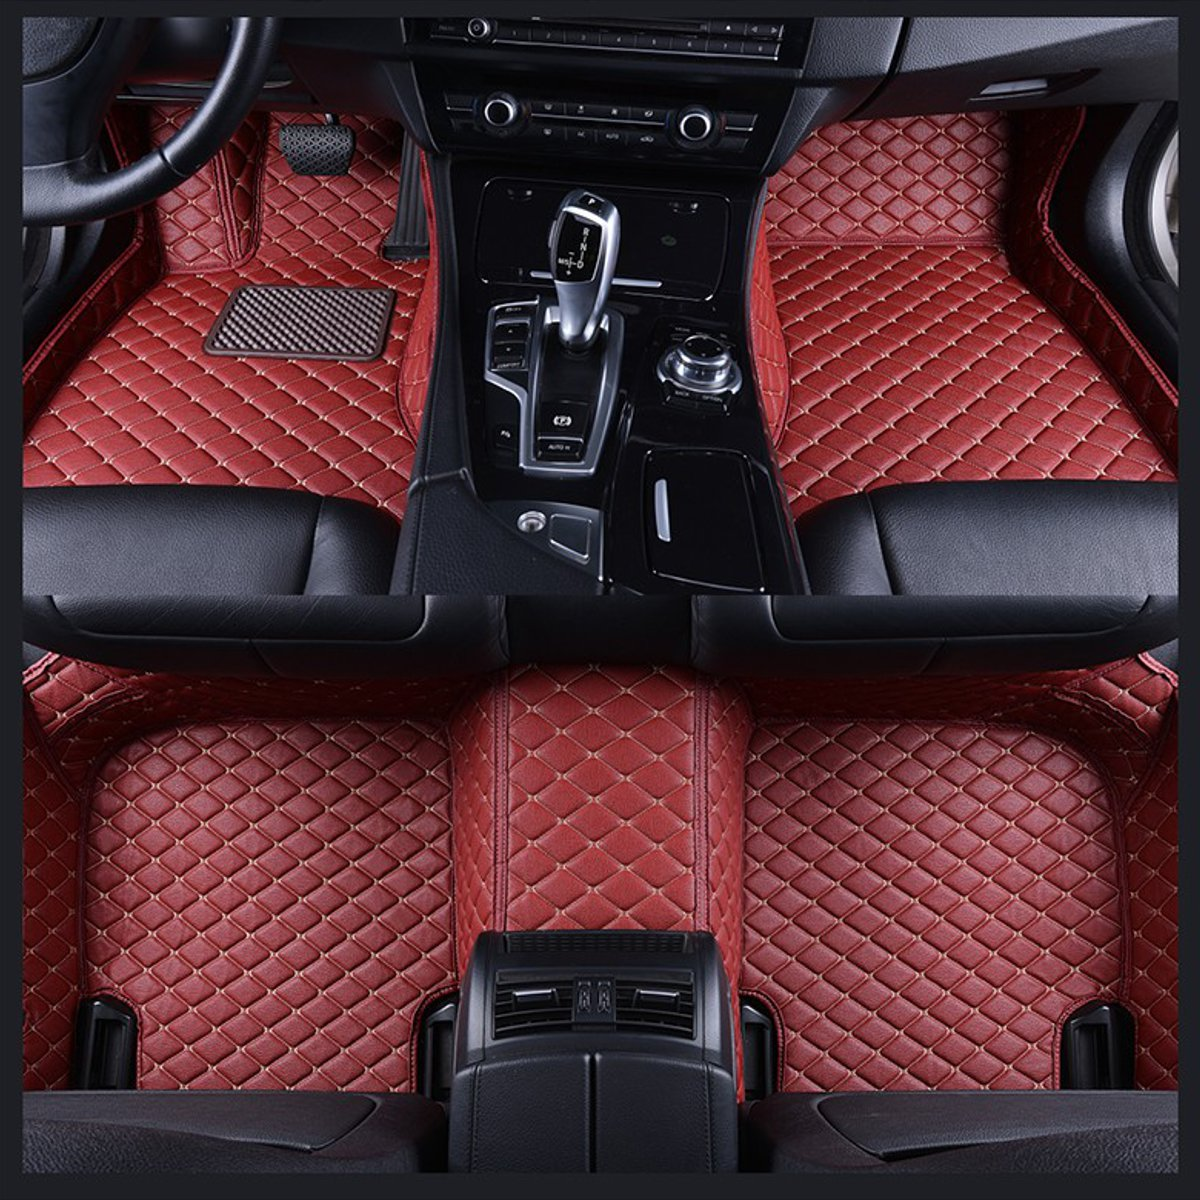 BMW 3 SERIES E93 LEFT DRIVE CABRIOLET 05-11  BEIGE QUALITY CAR MAT  4 x PADS